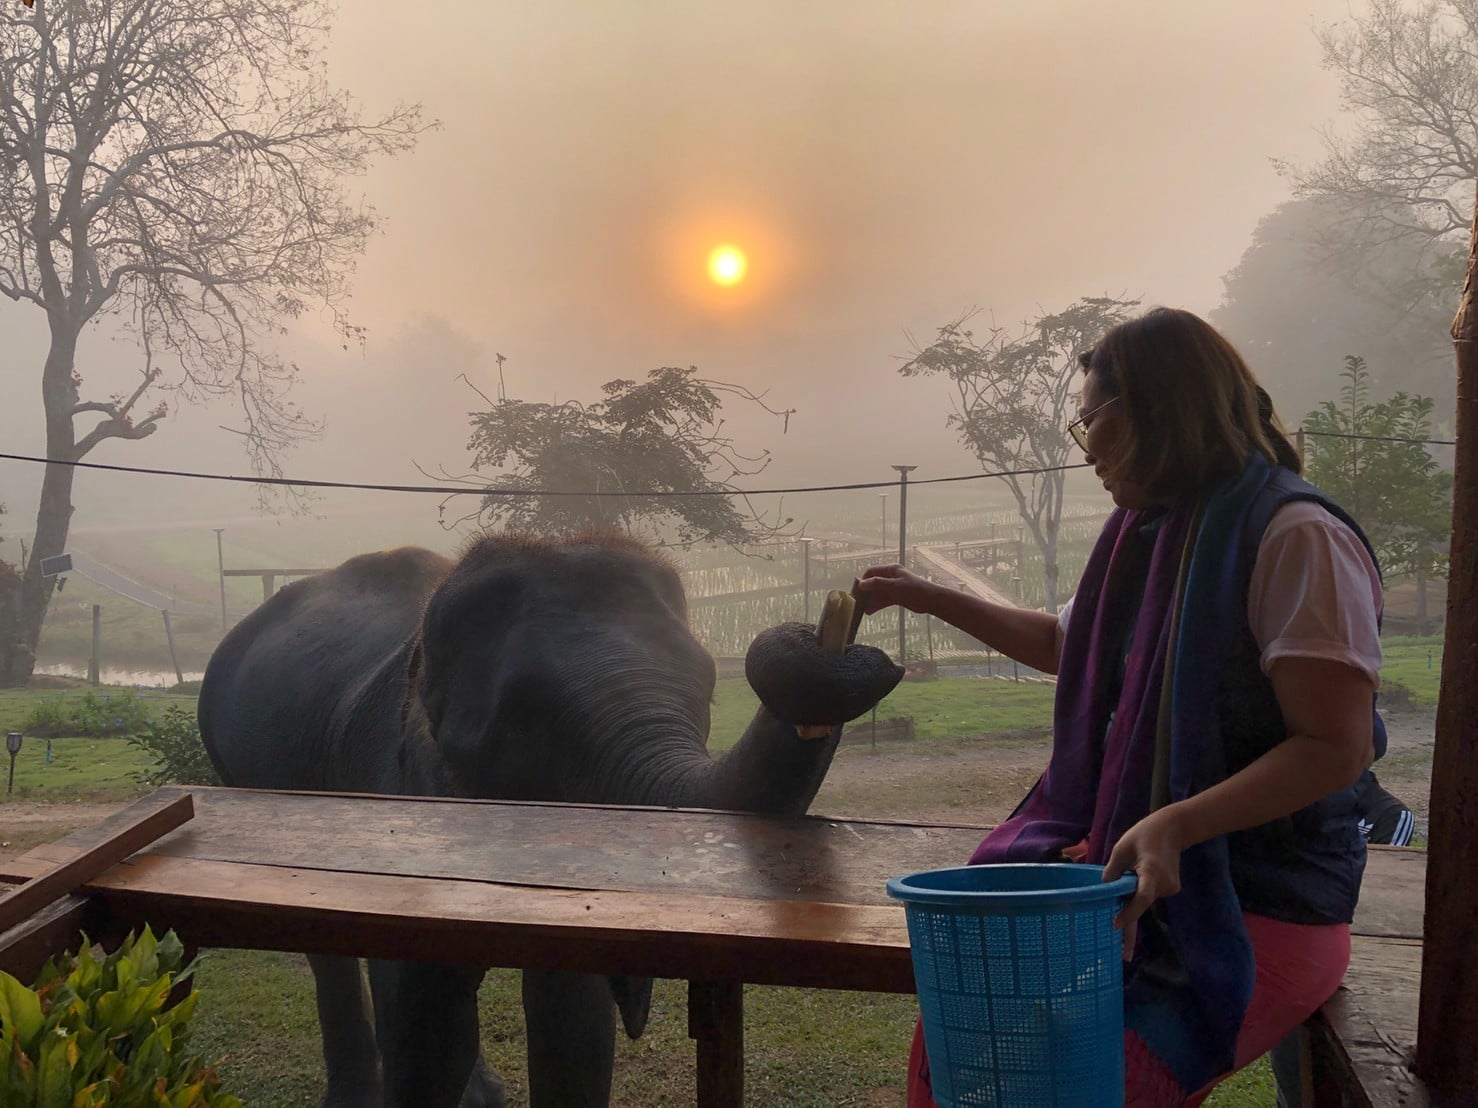 Chiang Mai Elephant home - Bamboo House - บ้านไม้ไผ่ - Maewang - Elephant Morning call